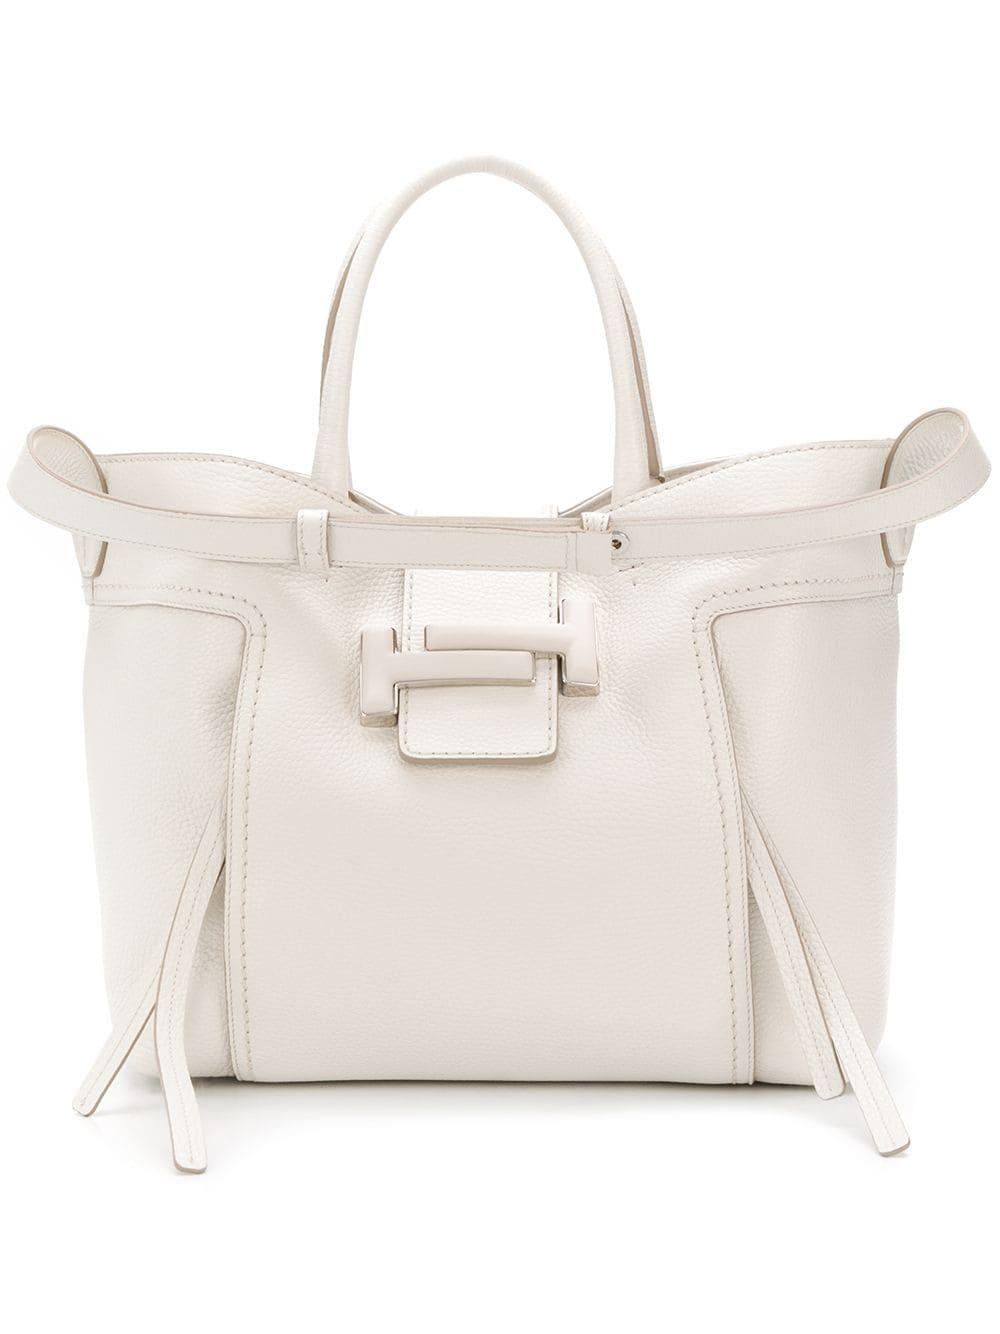 Tod's 'Double T' Handtasche - Weiß